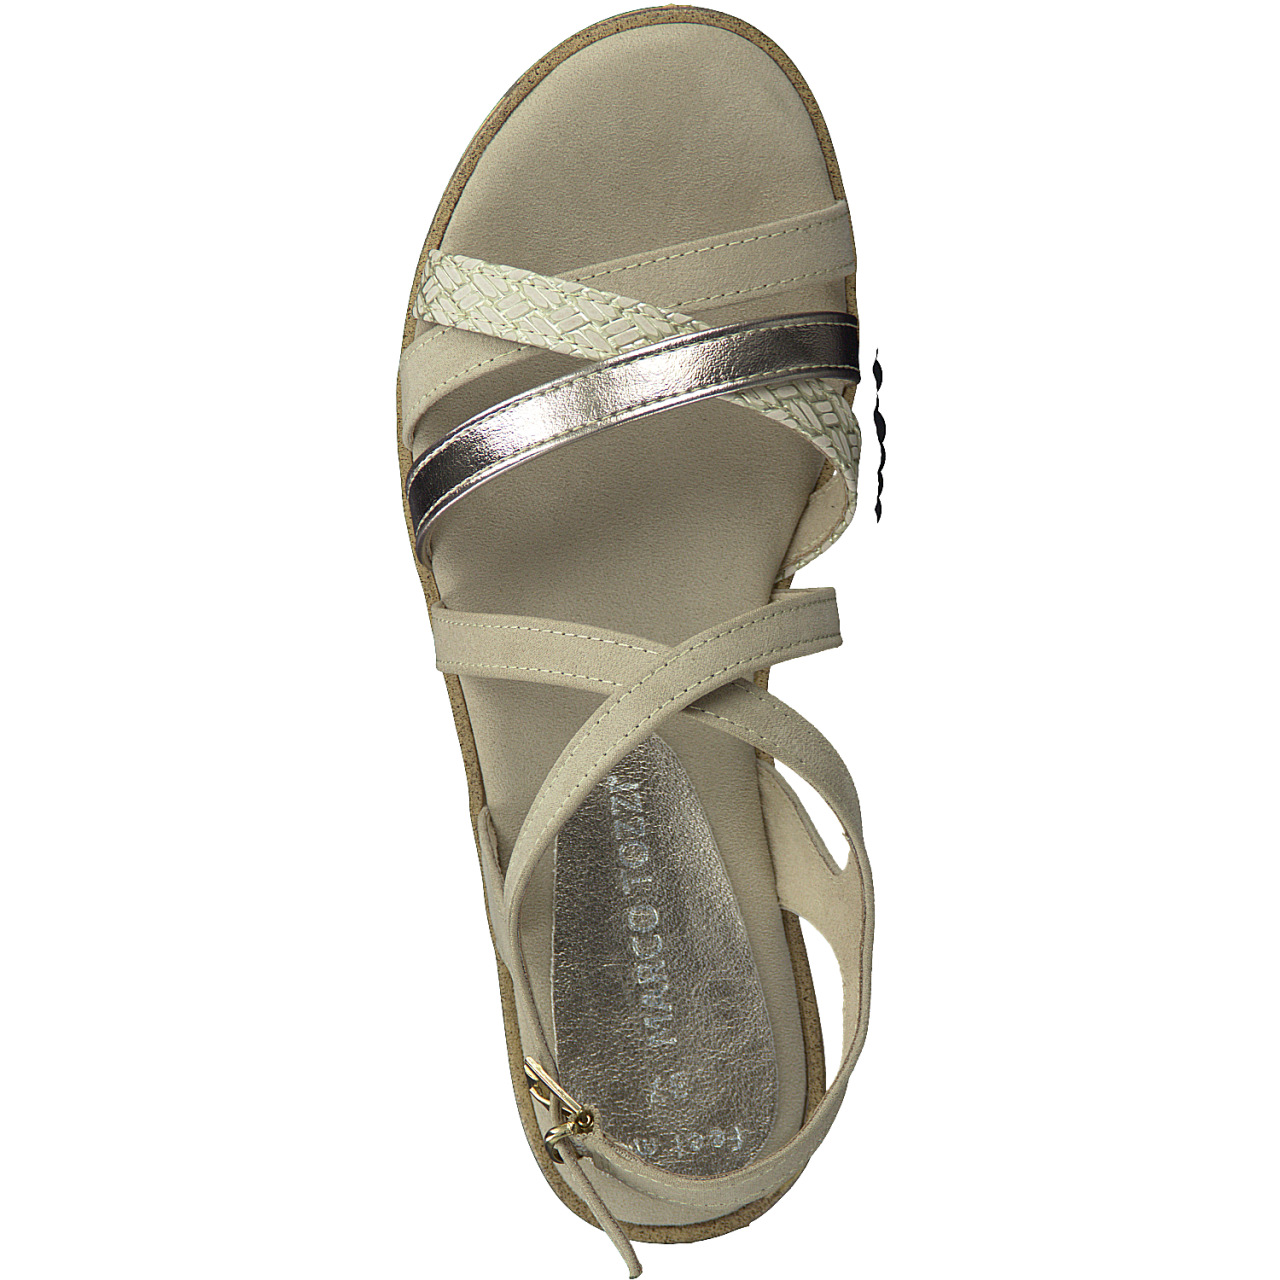 28602 MT Sandal